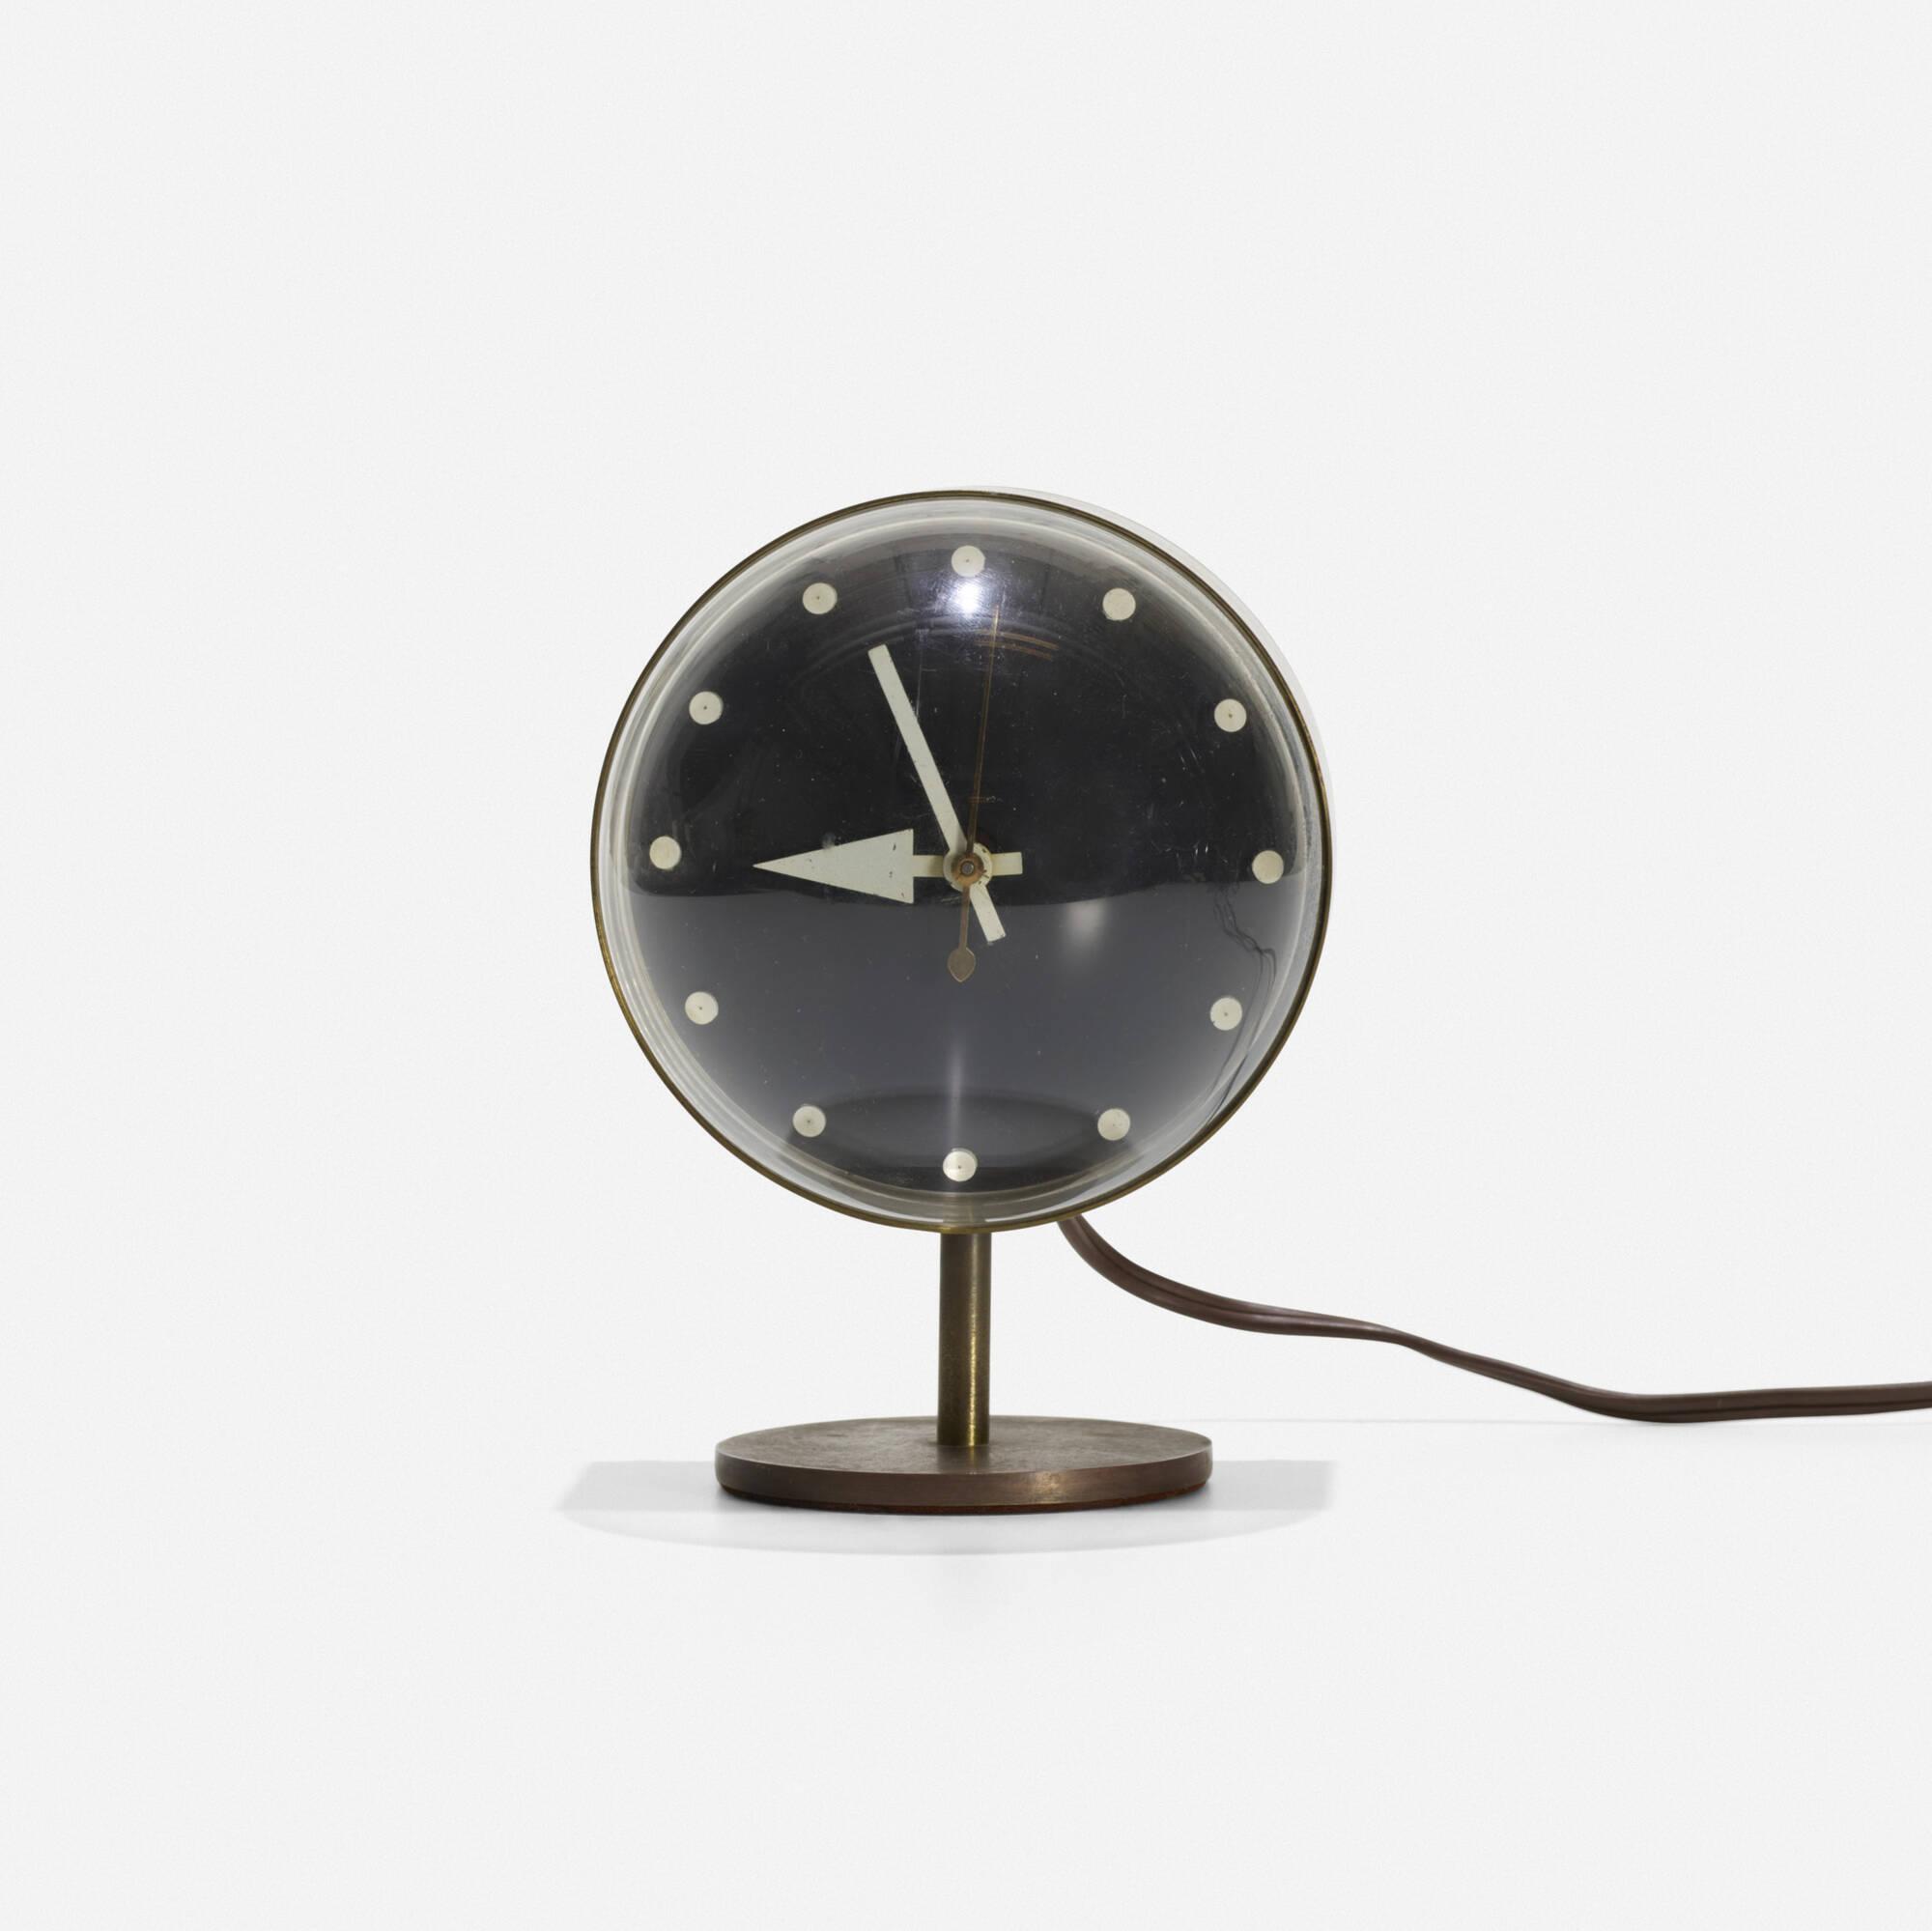 125: George Nelson & Associates / table clock, model 4766 (1 of 2)